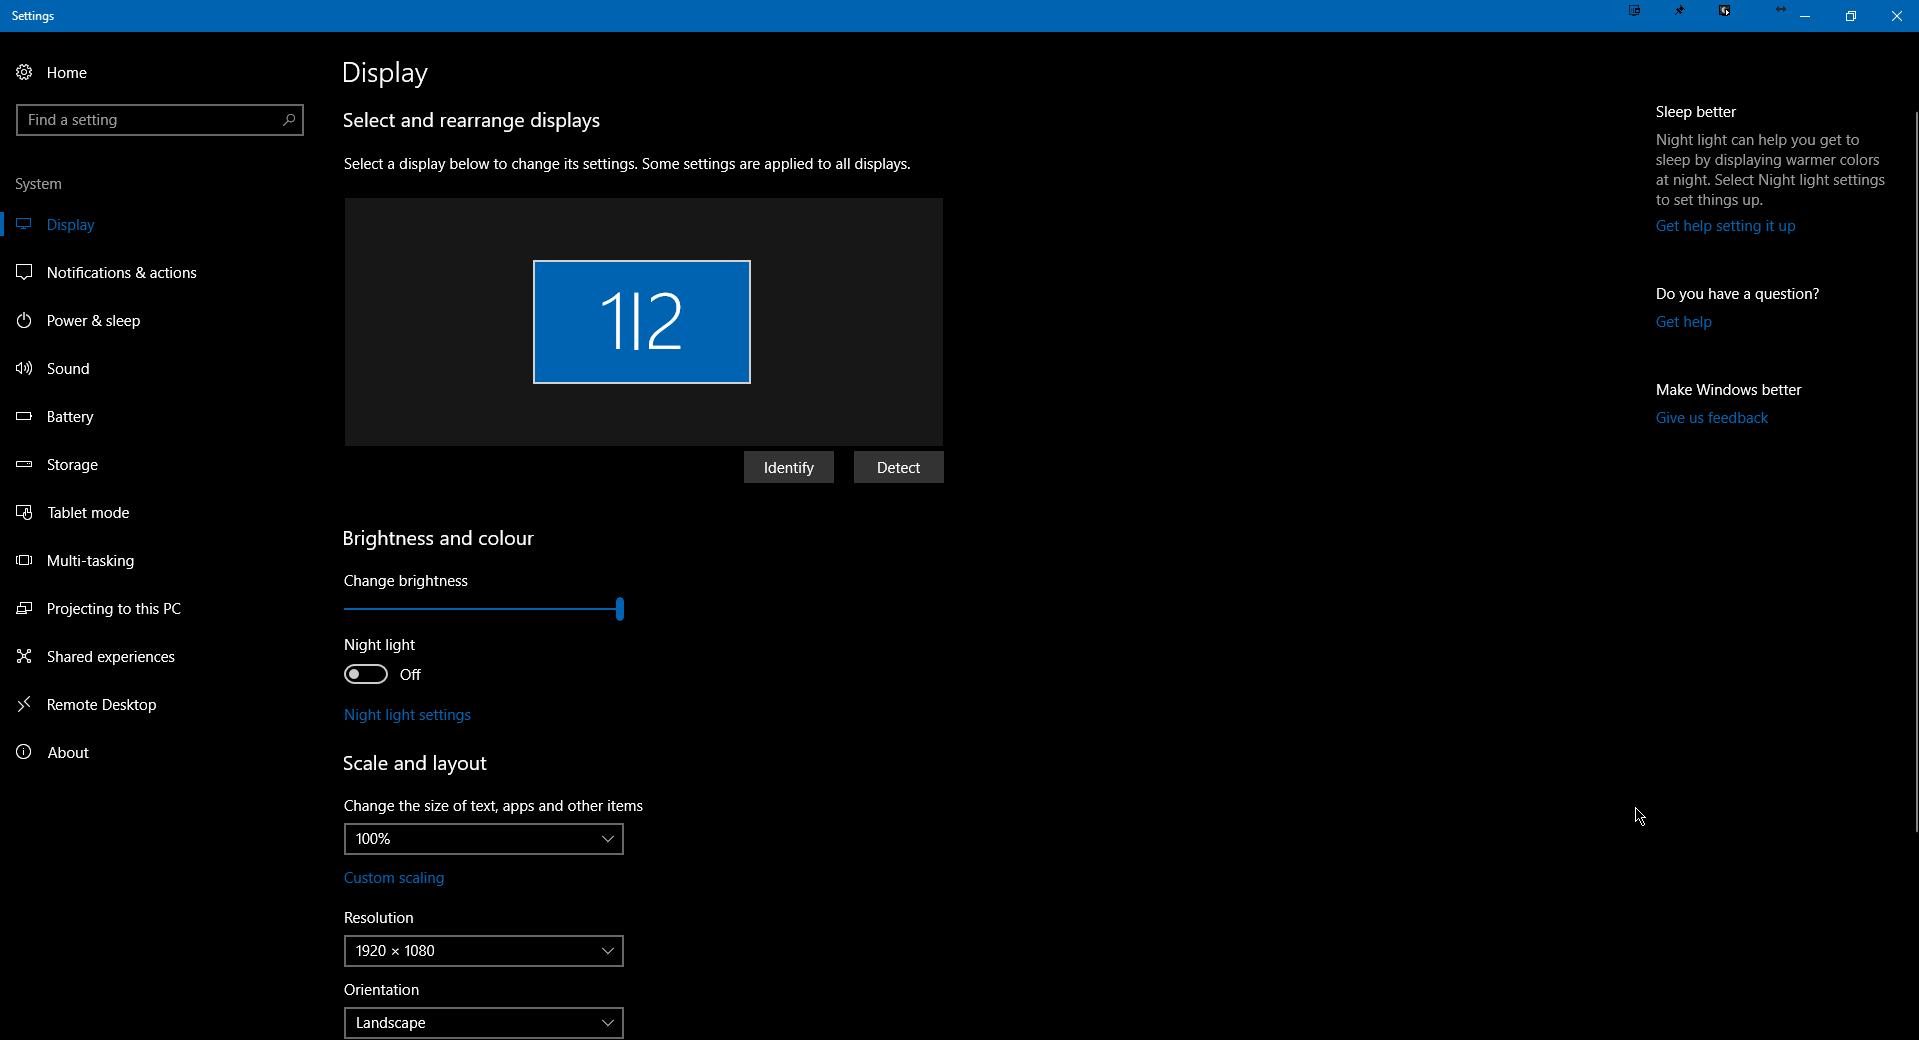 Windows 10 display settings - mirrored display